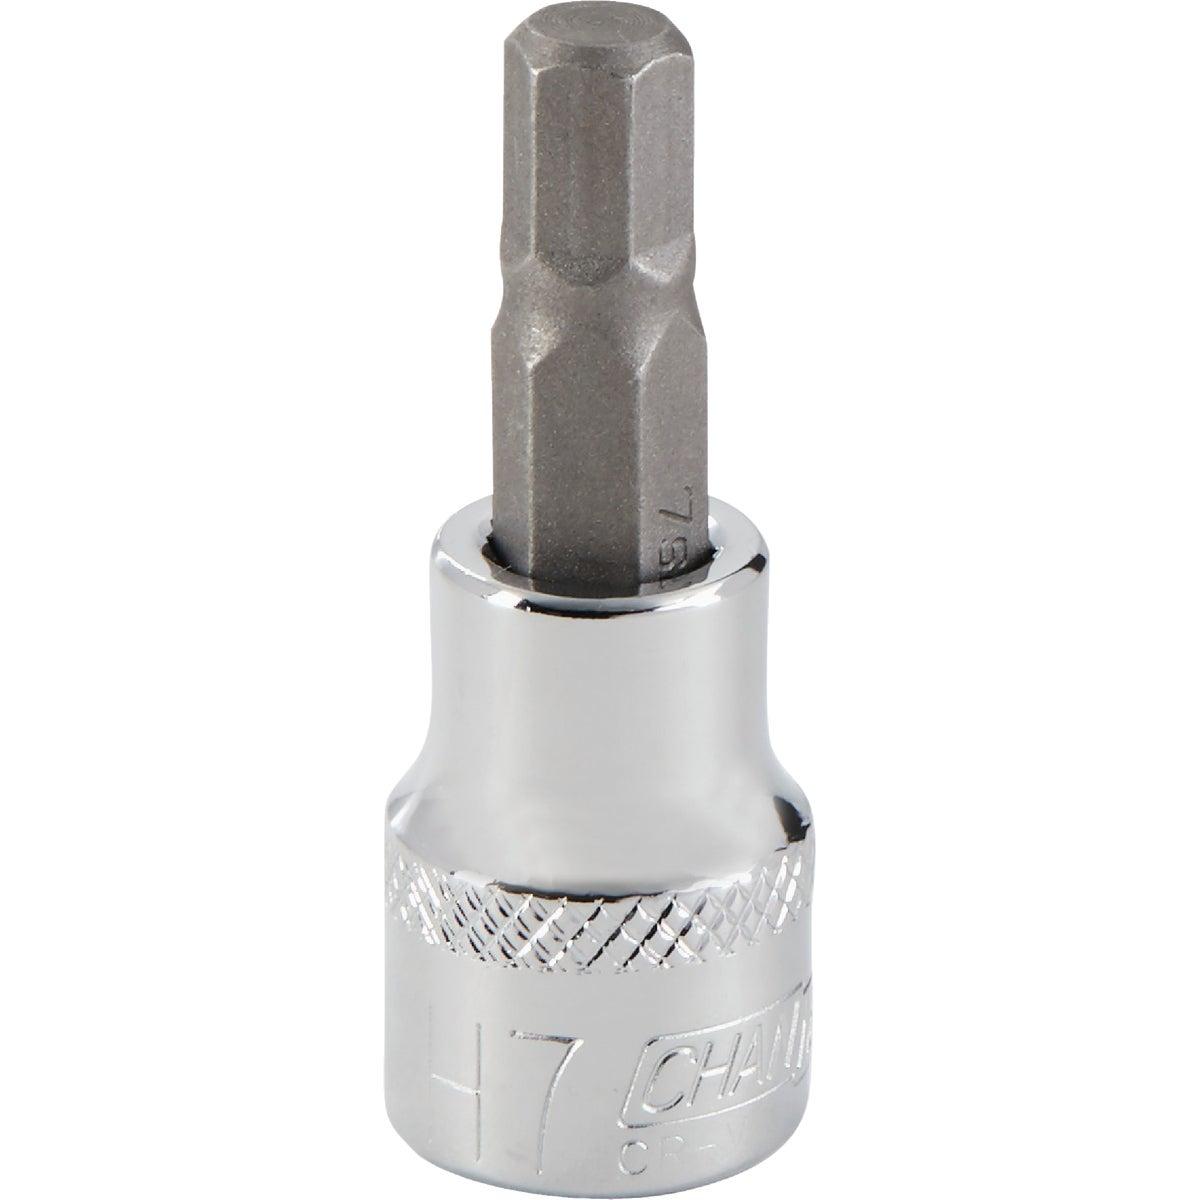 Best Way Tools 7MM HEX BIT SOCKET 372366